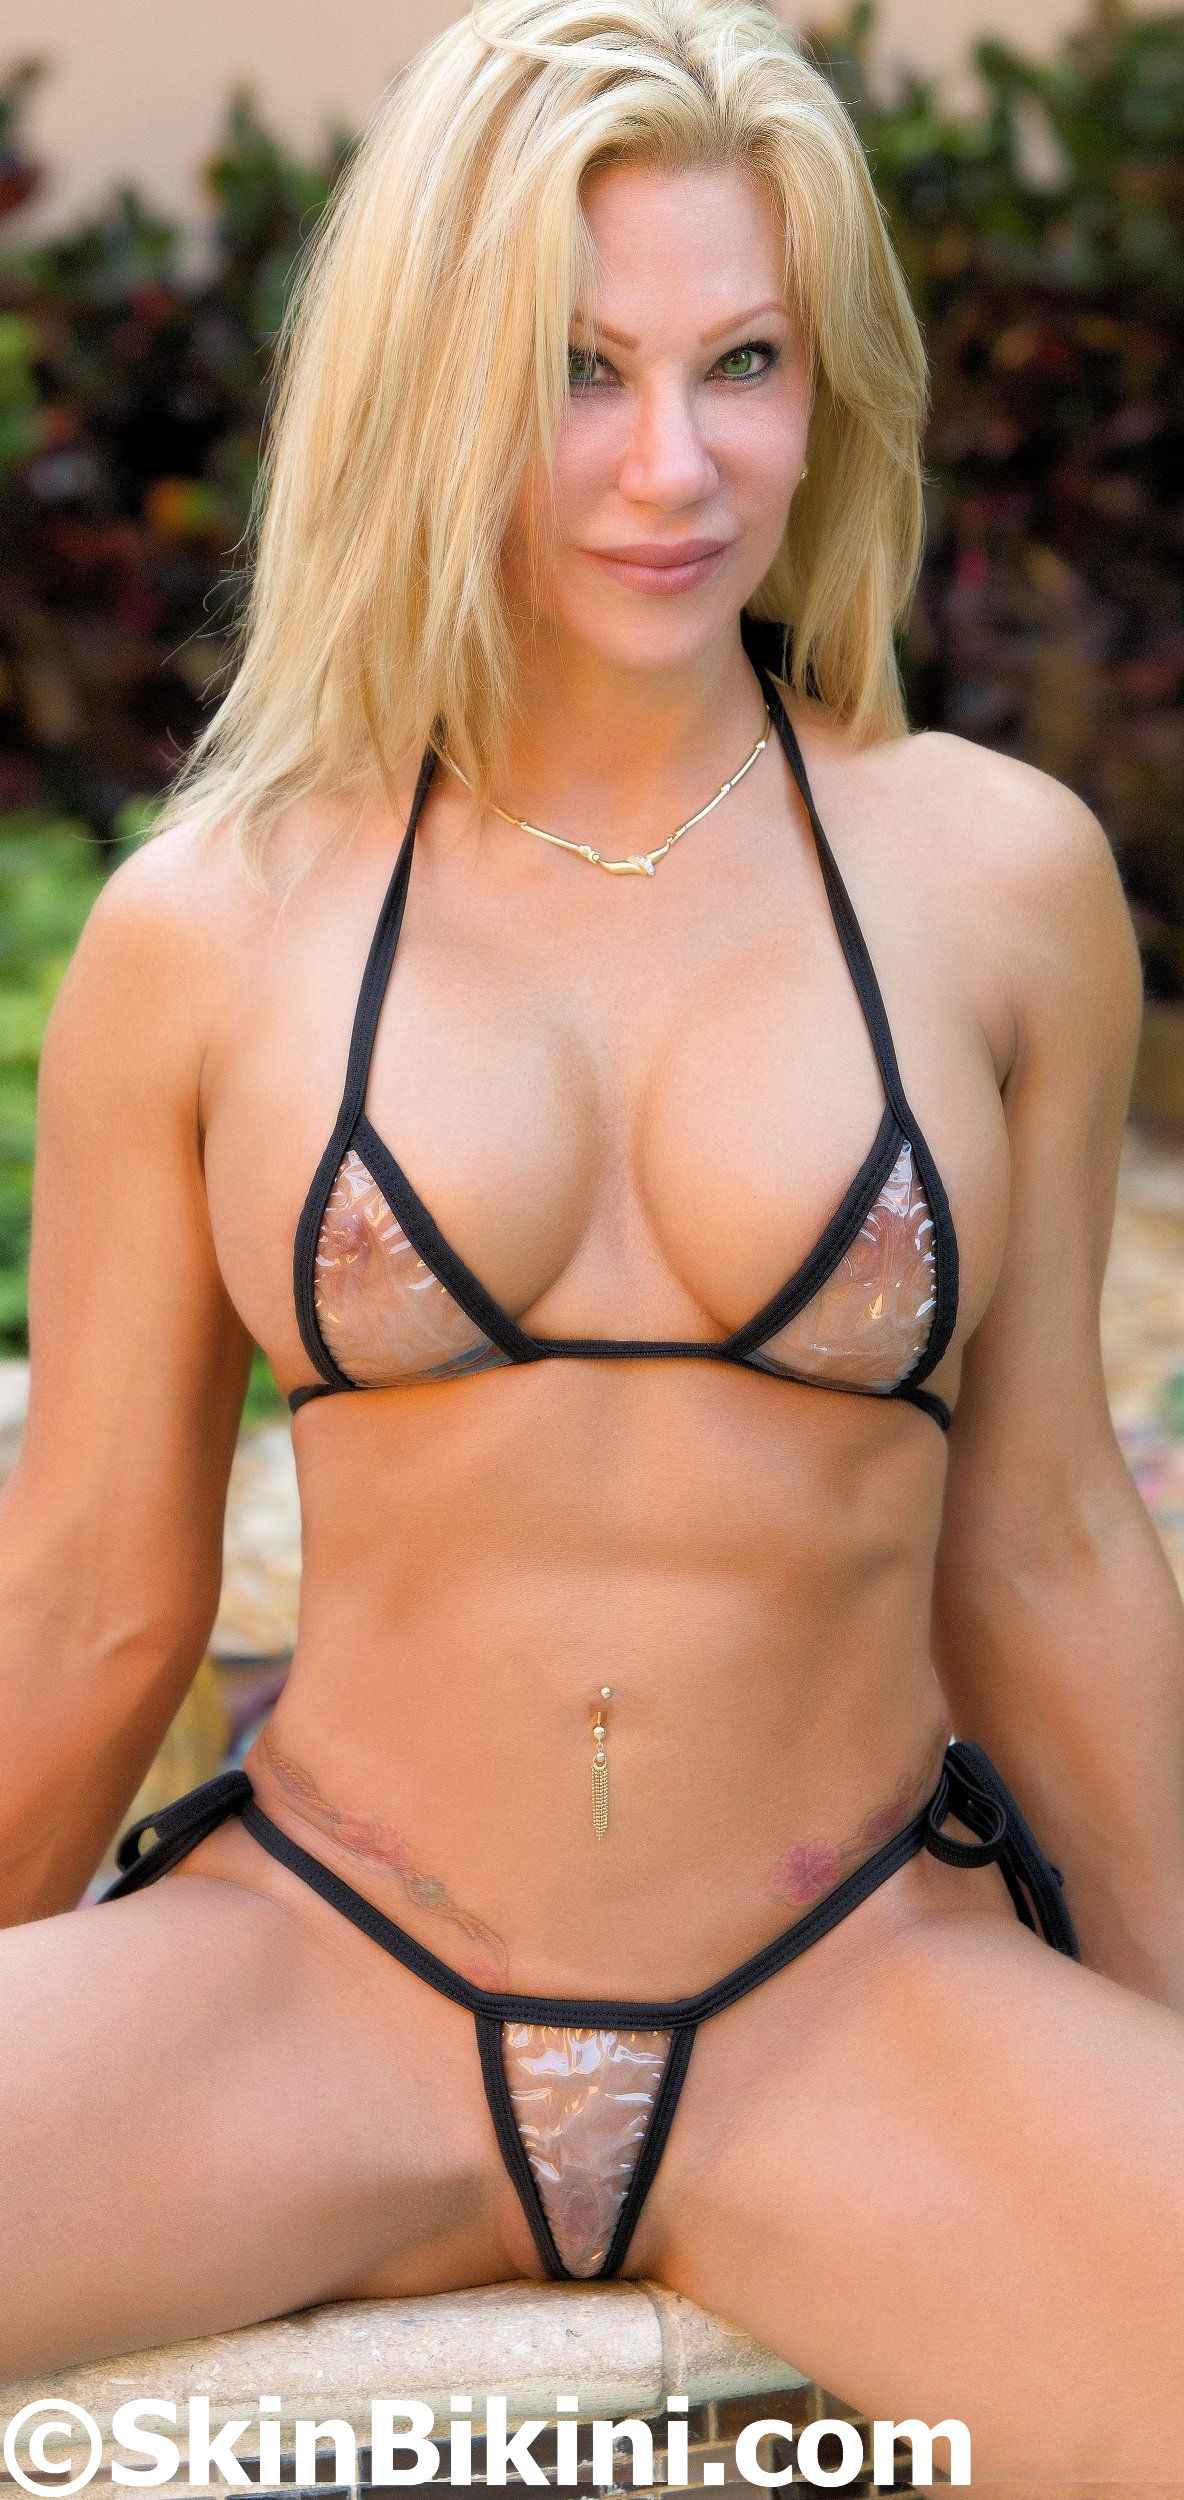 sexy PVC see-thru micro thong bikini from skinbikini.com